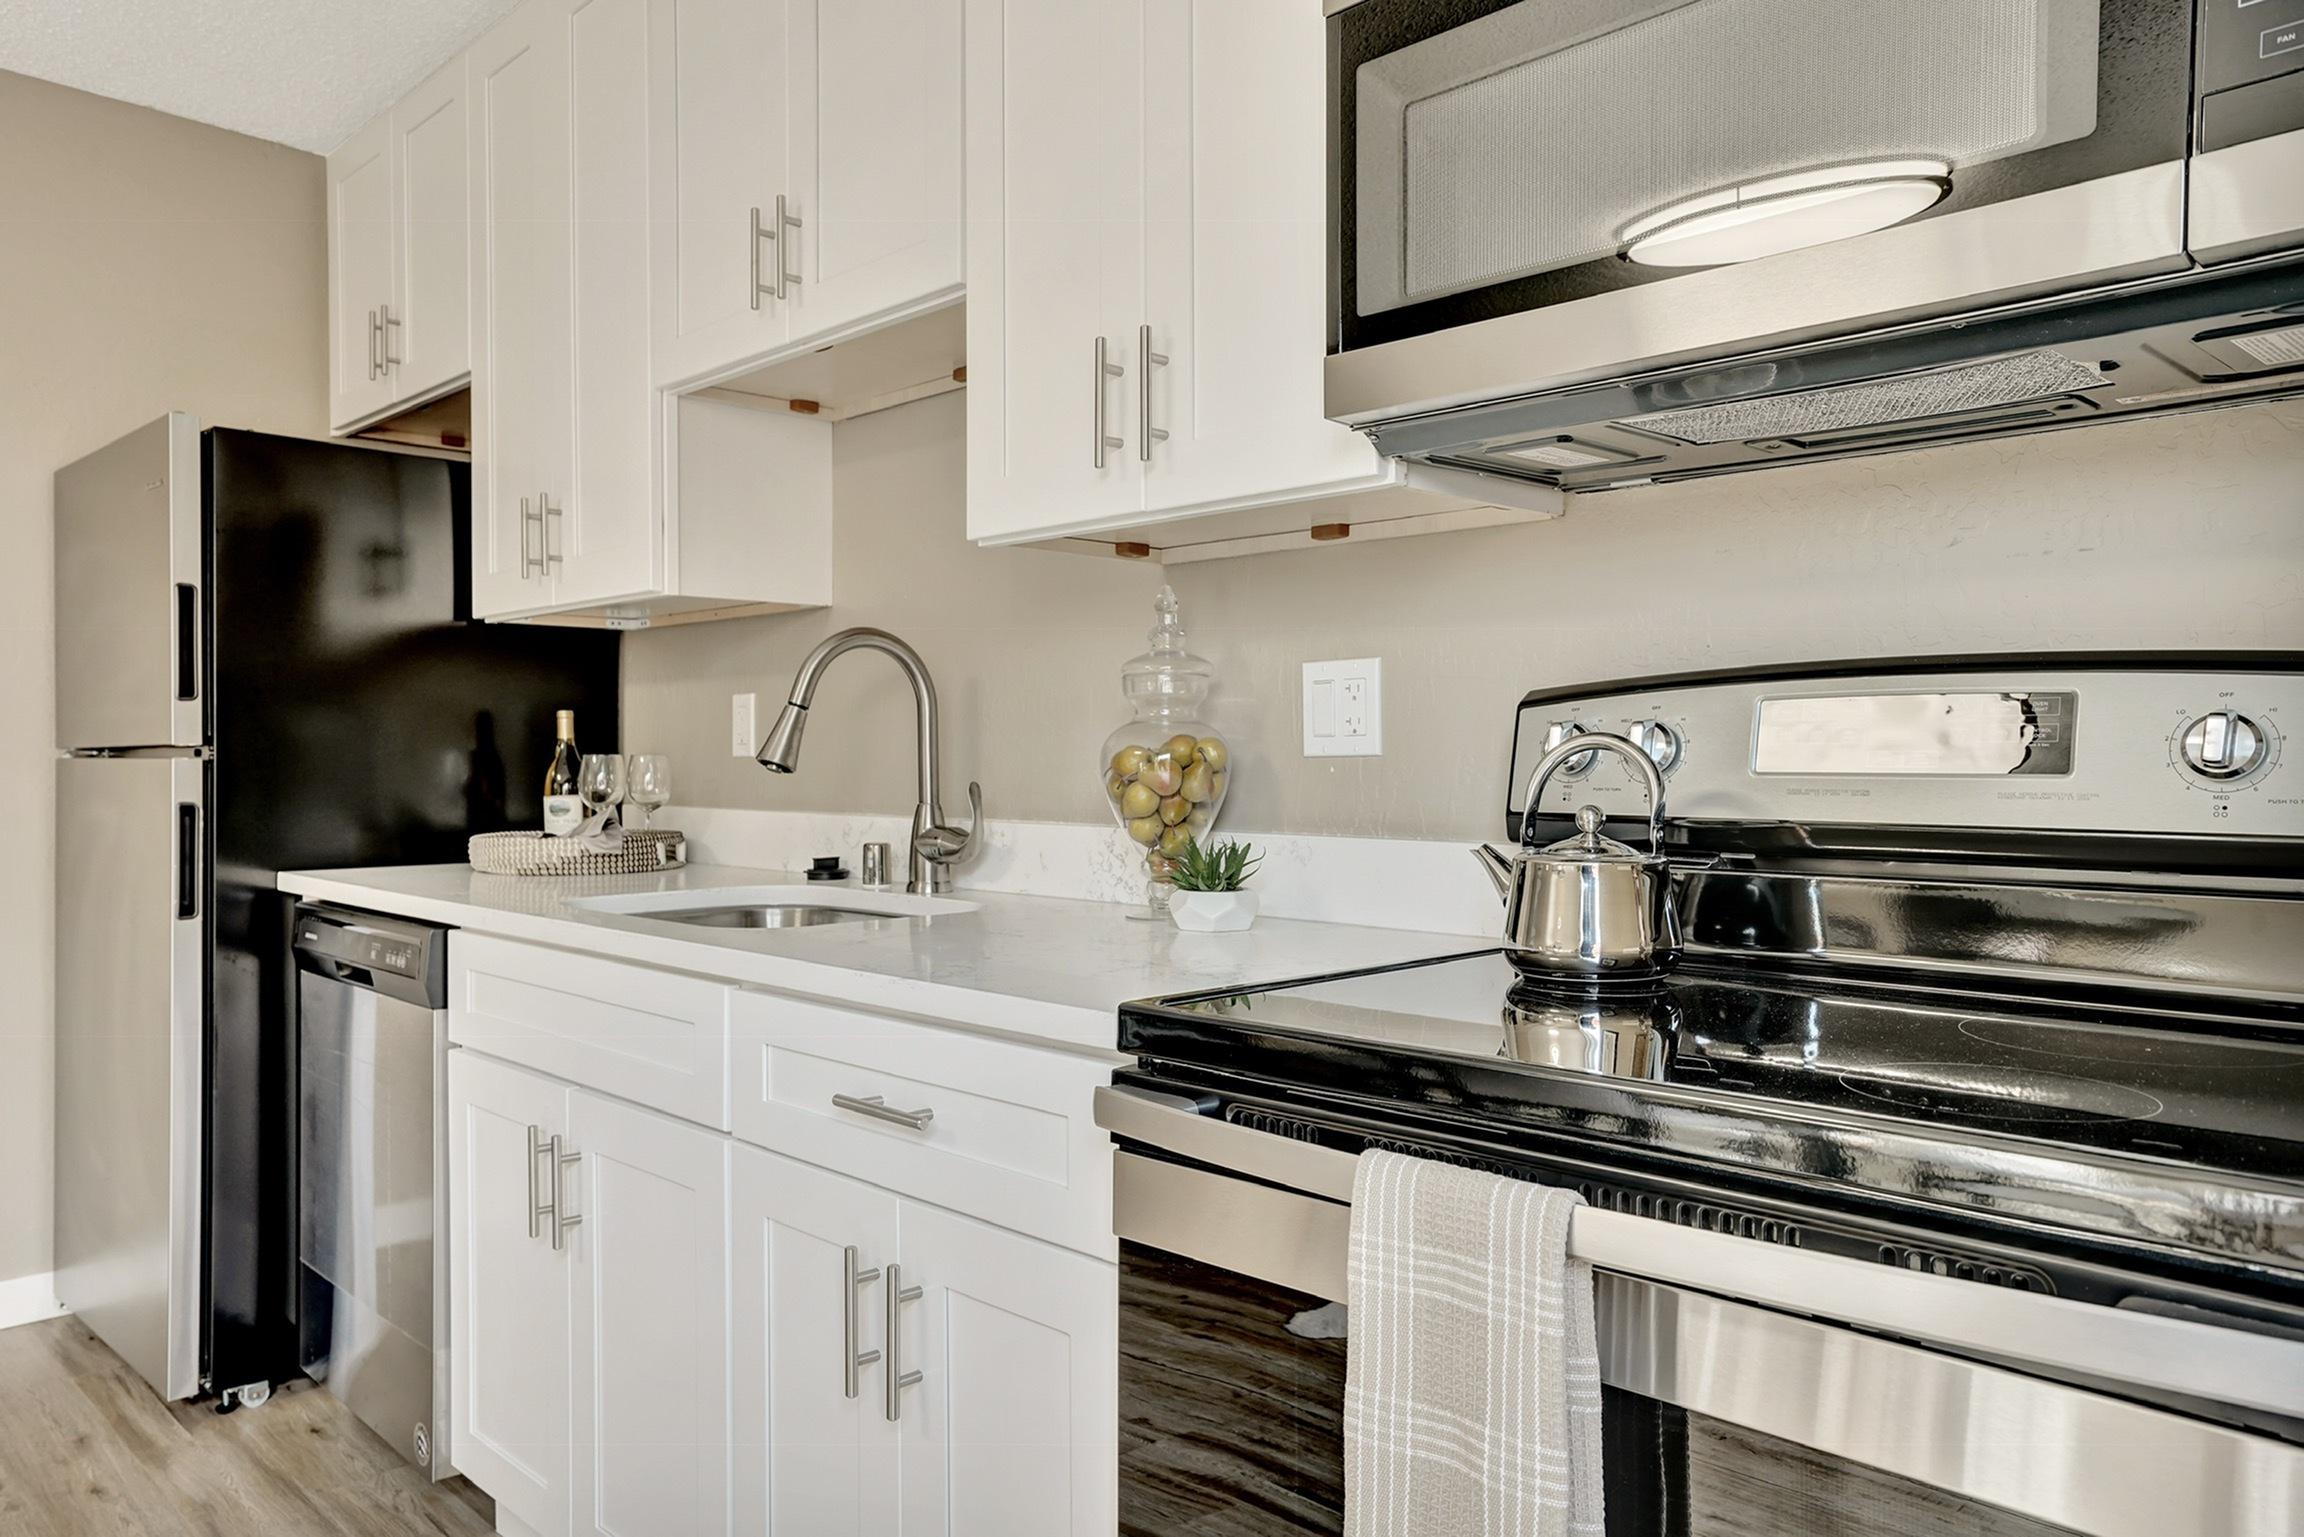 Image of Upgraded Kitchen for Parkside Gardens